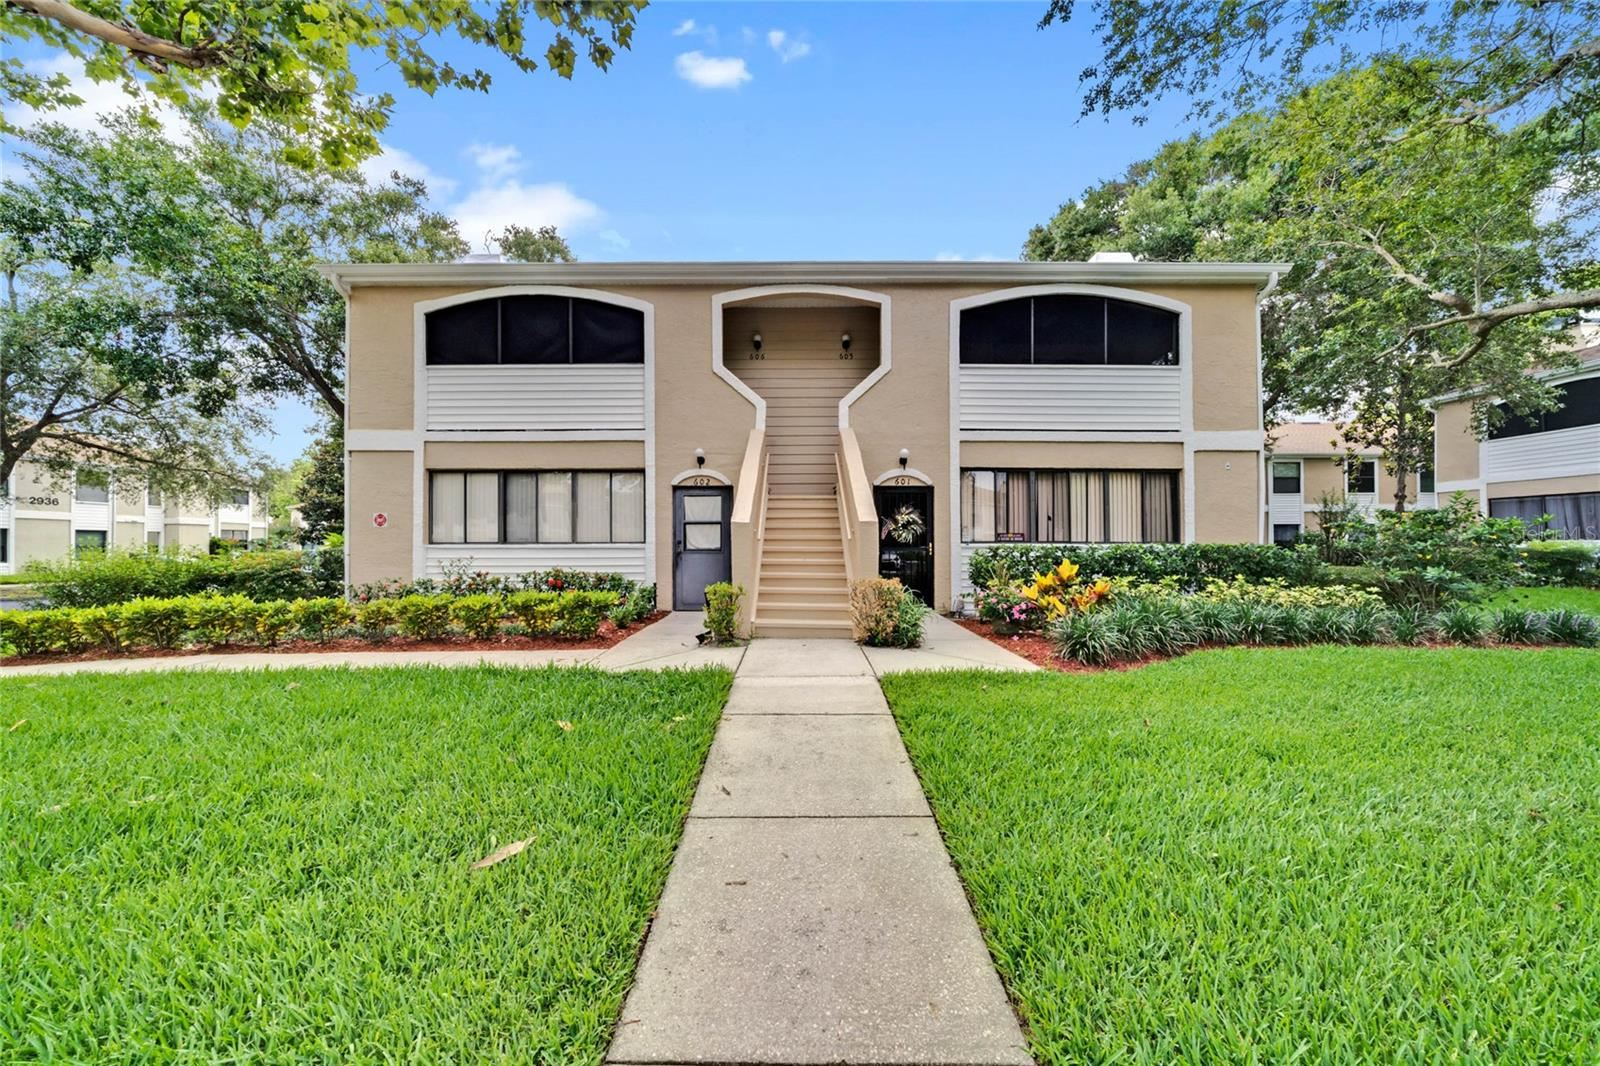 3136 S SEMORAN BOULEVARD #605, Orlando, FL 32822 - MLS#: O5949788